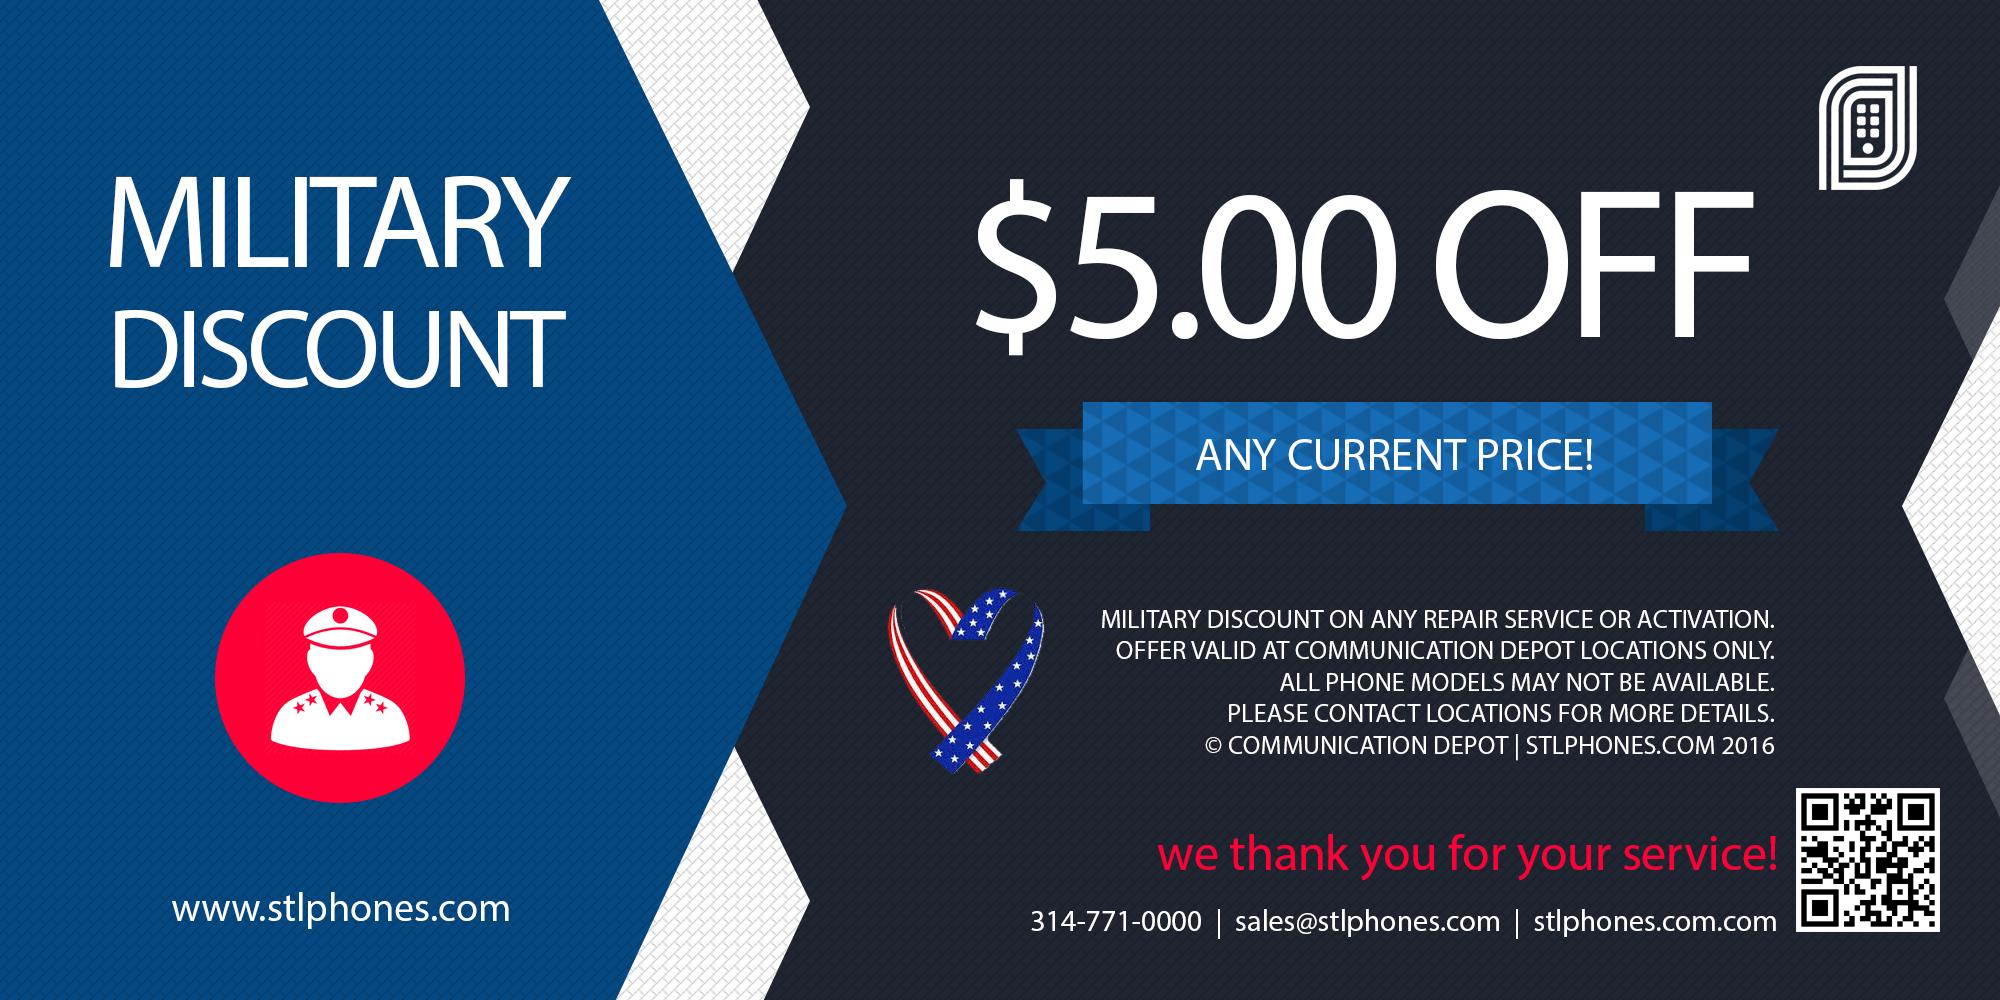 2016-COMMUNICATION-DEPOT-military-discount-coupon_b5568b4c-5093-4168-9a00-b746b01d478d.png